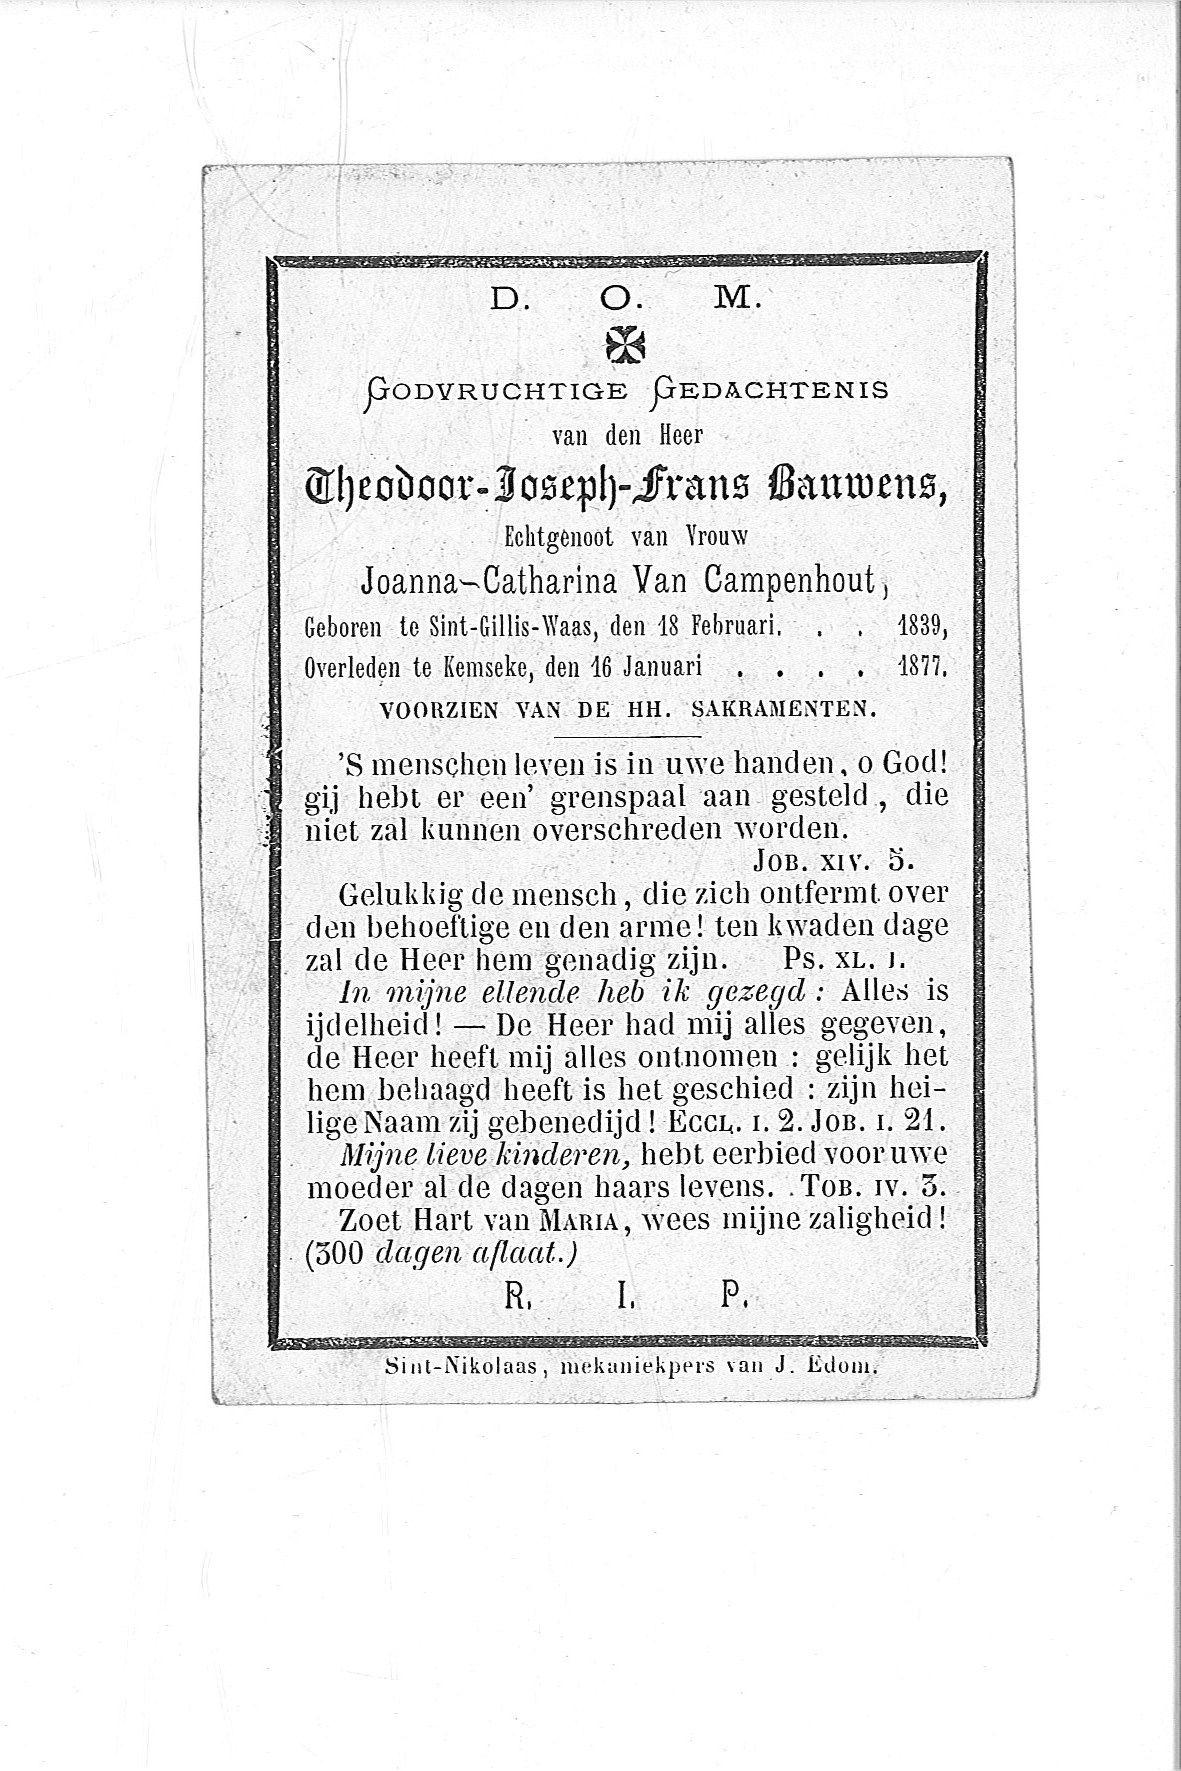 Theodoor-Joseph-Frans(1877)20090806114958_00046.jpg